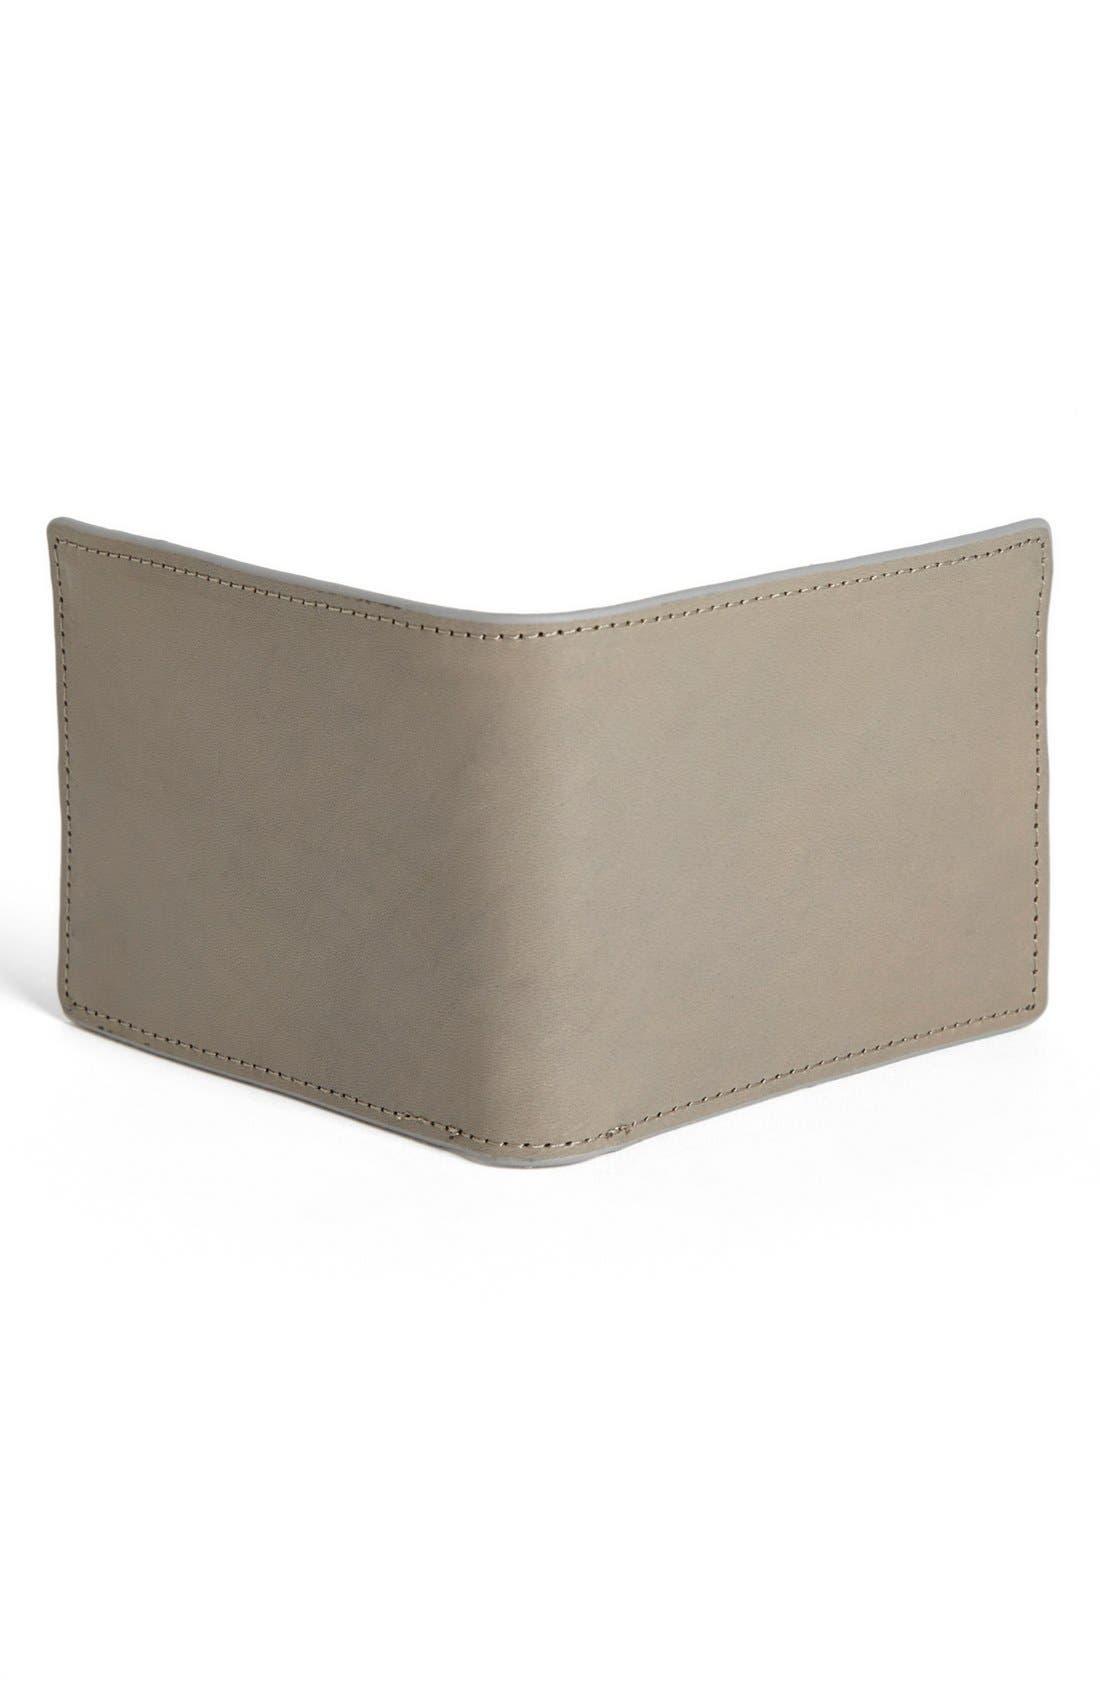 Alternate Image 3  - J Fold 'Havana' Slim Fold Wallet